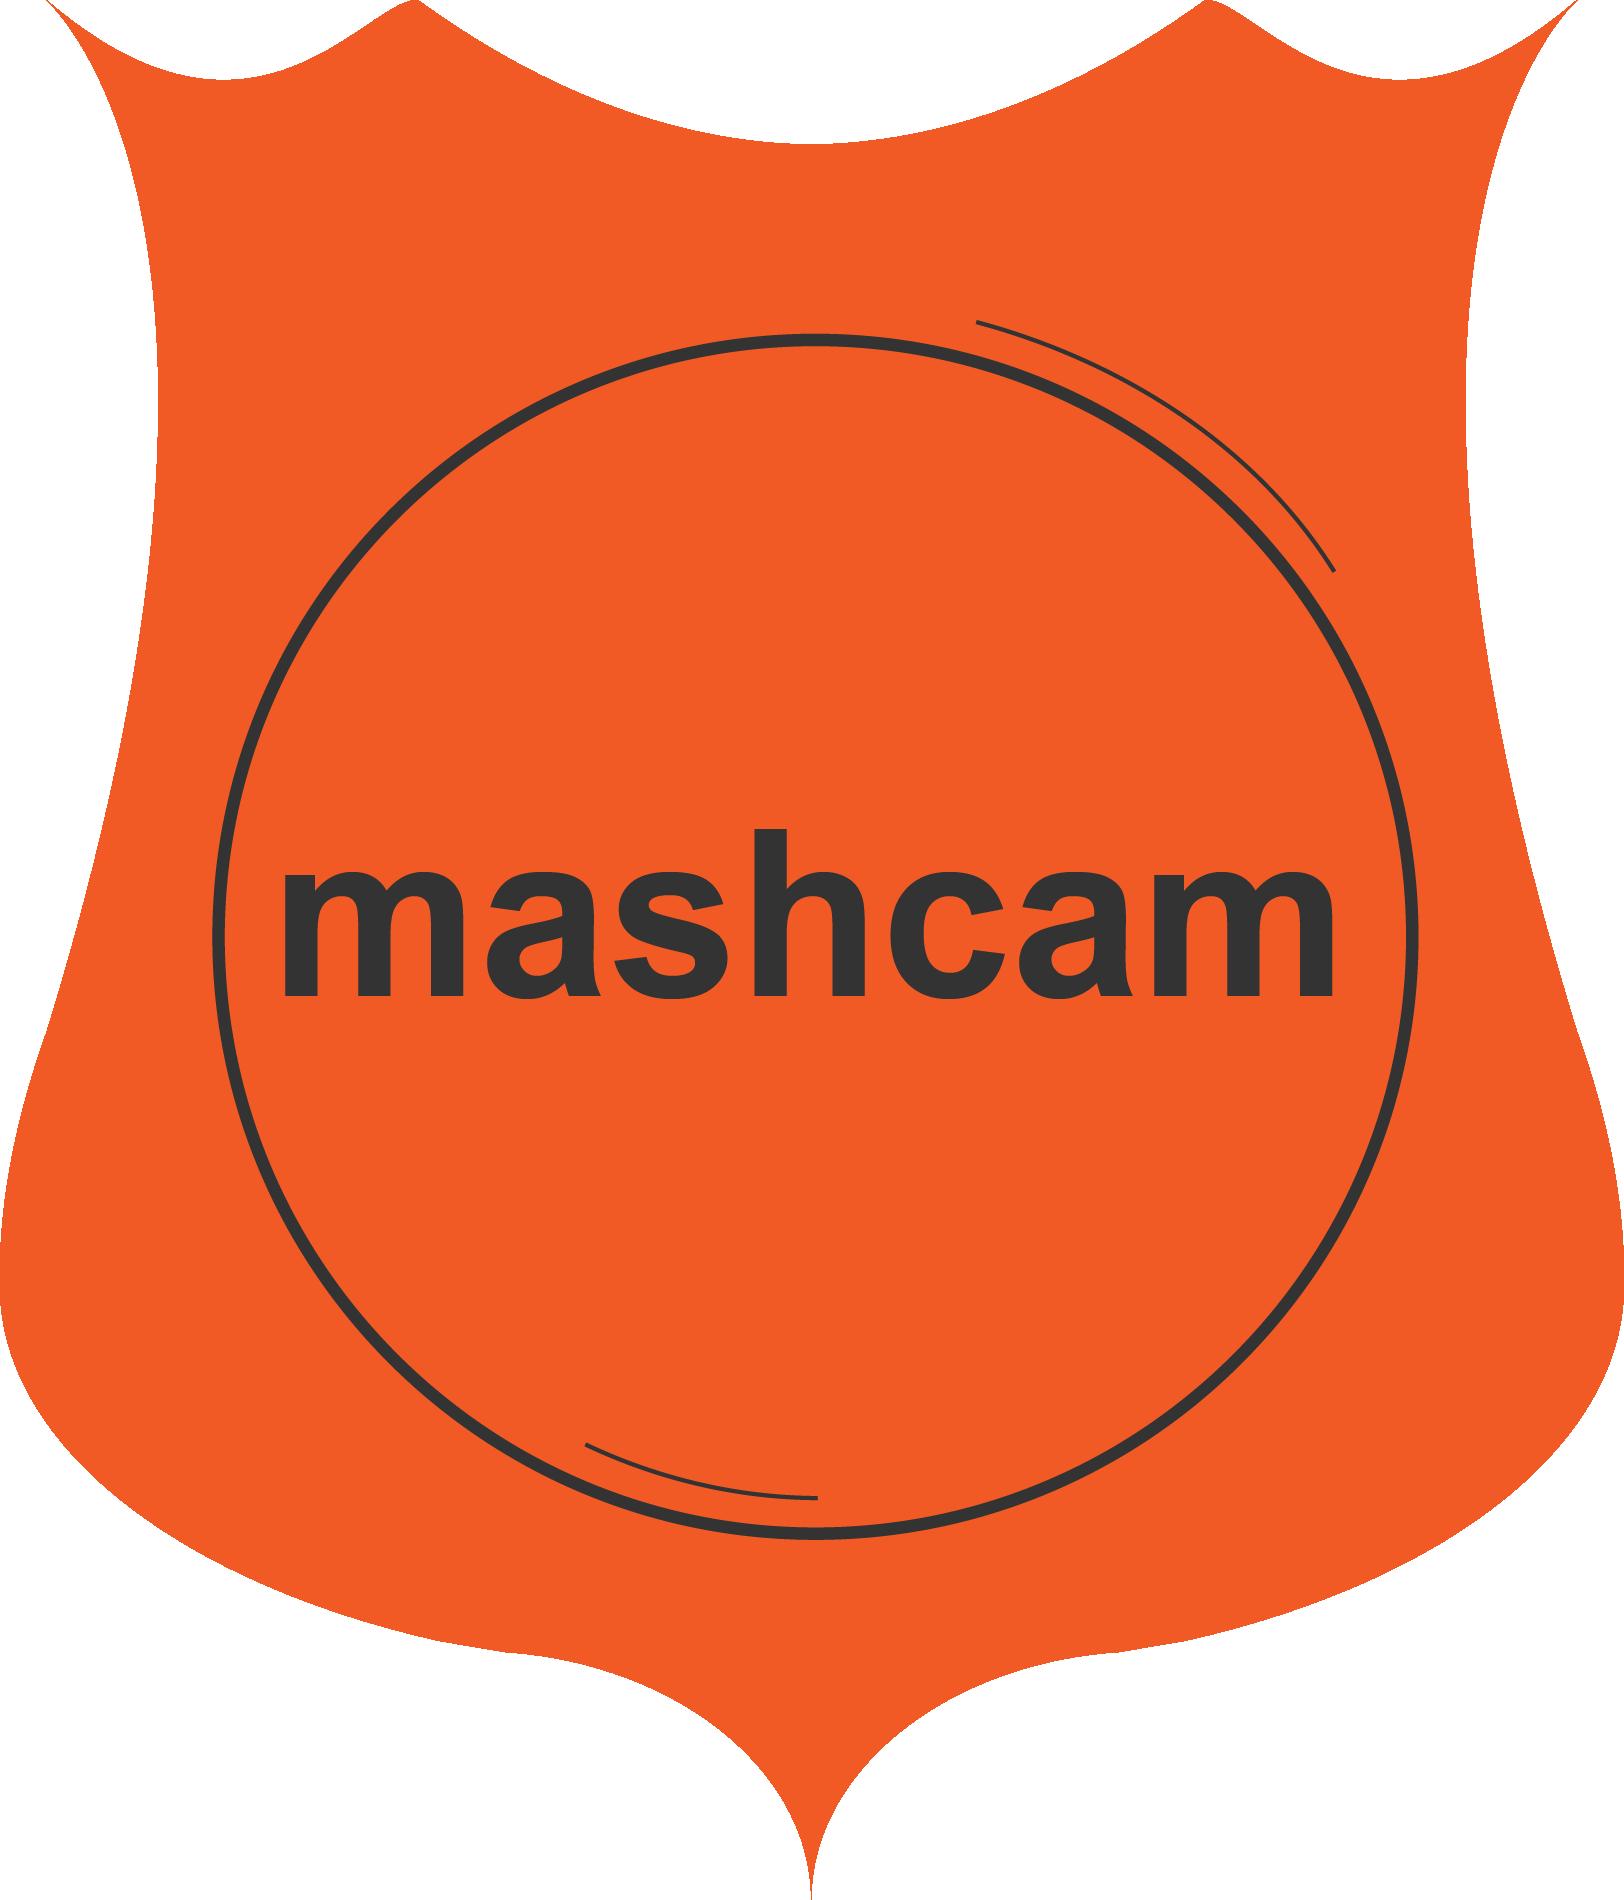 Mashcam Logo